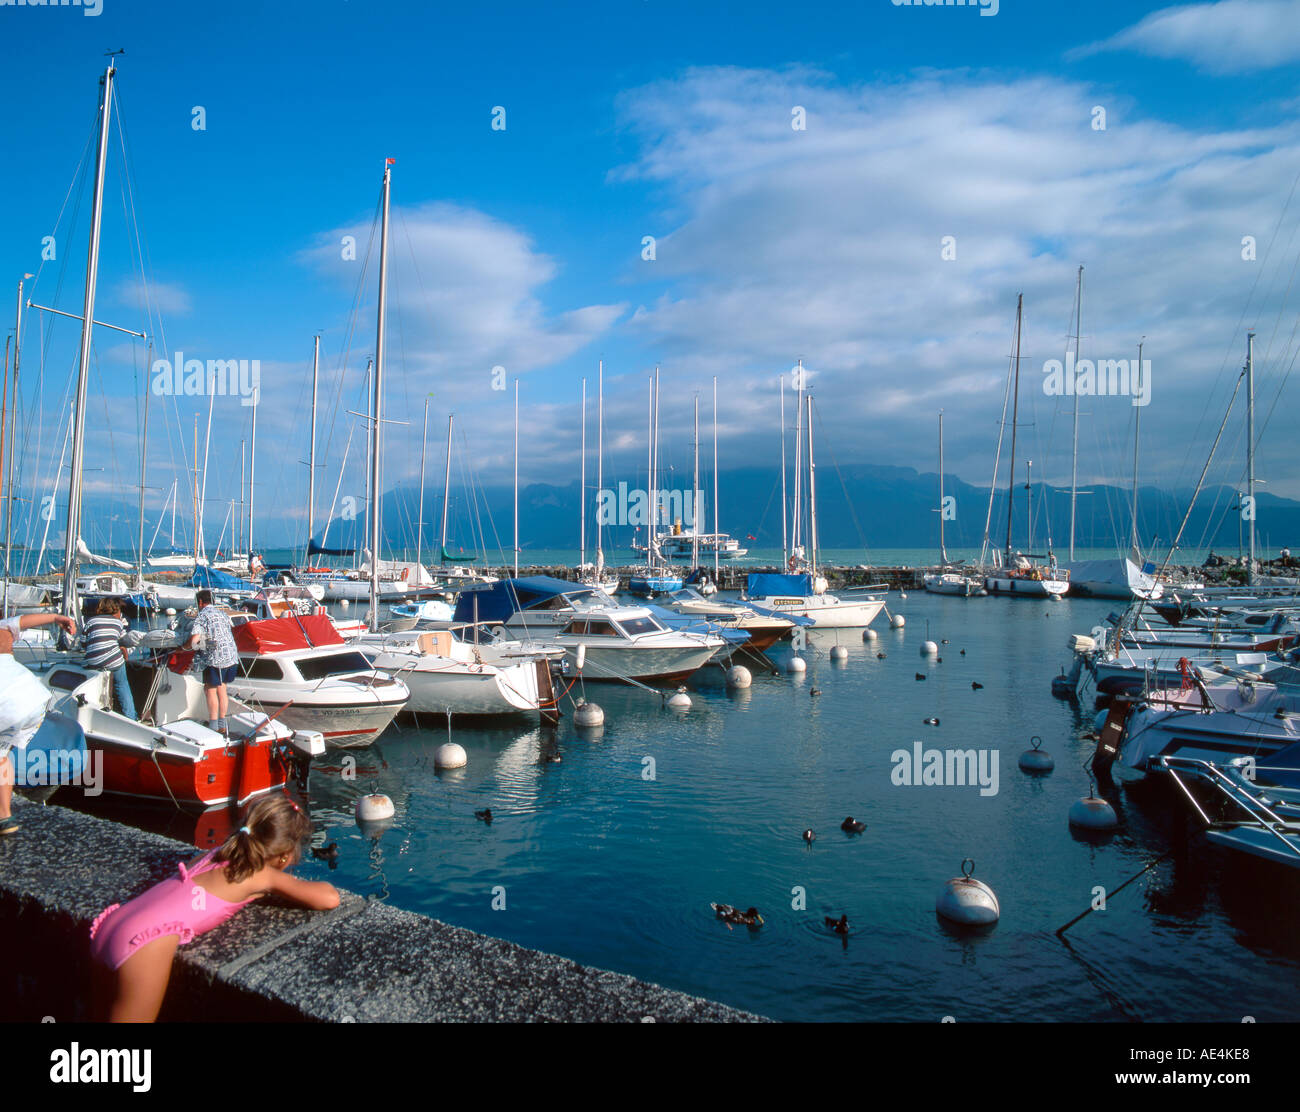 switzerland lake leman Lutry yachting harbour little girl - Stock Image